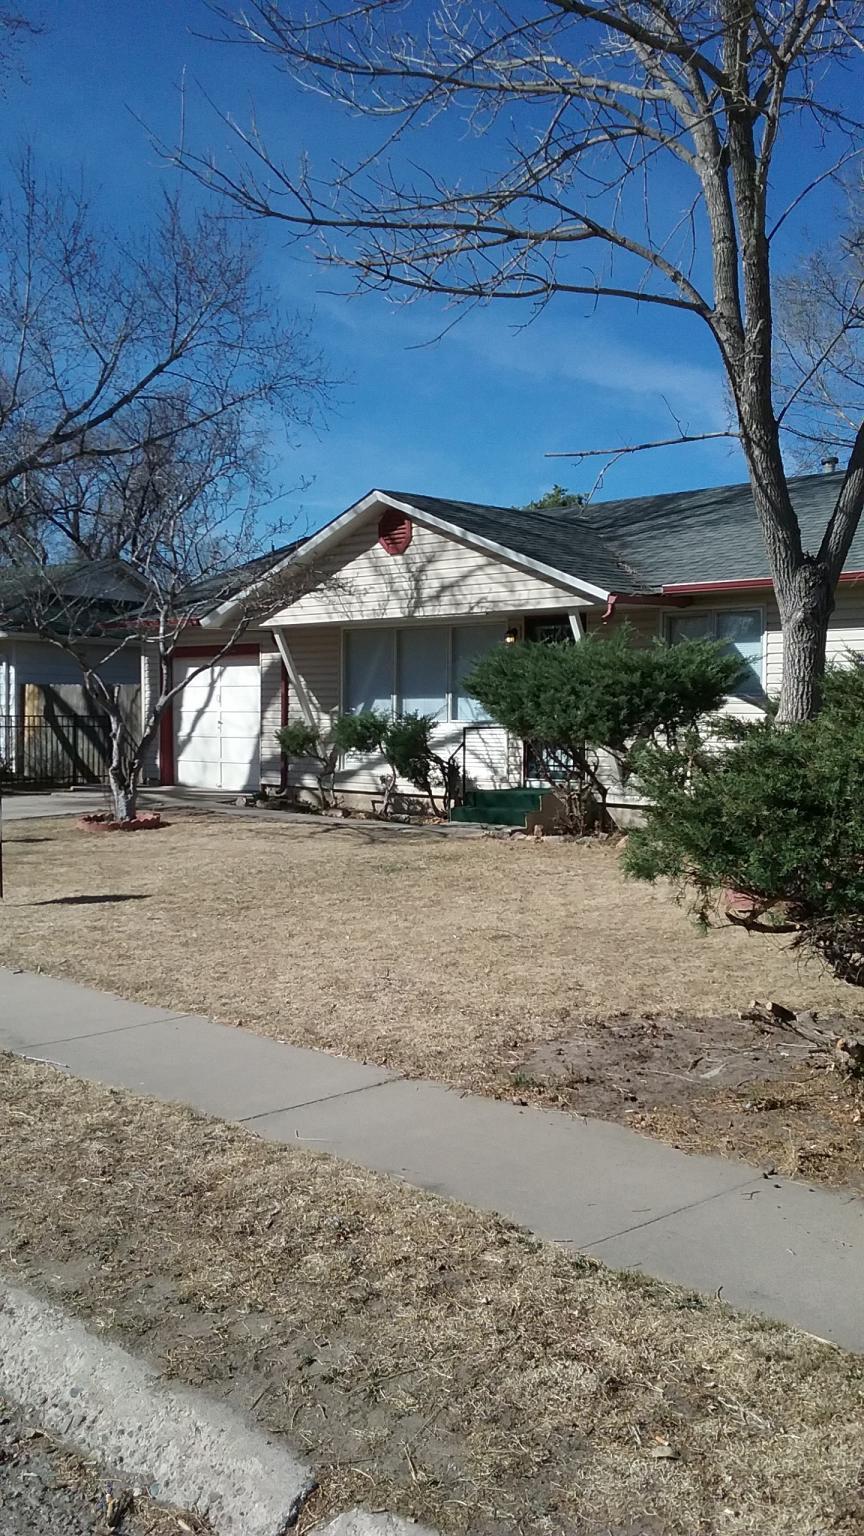 130 Balfour Ave, Colorado Springs, CO 80909 For Rent | Trulia